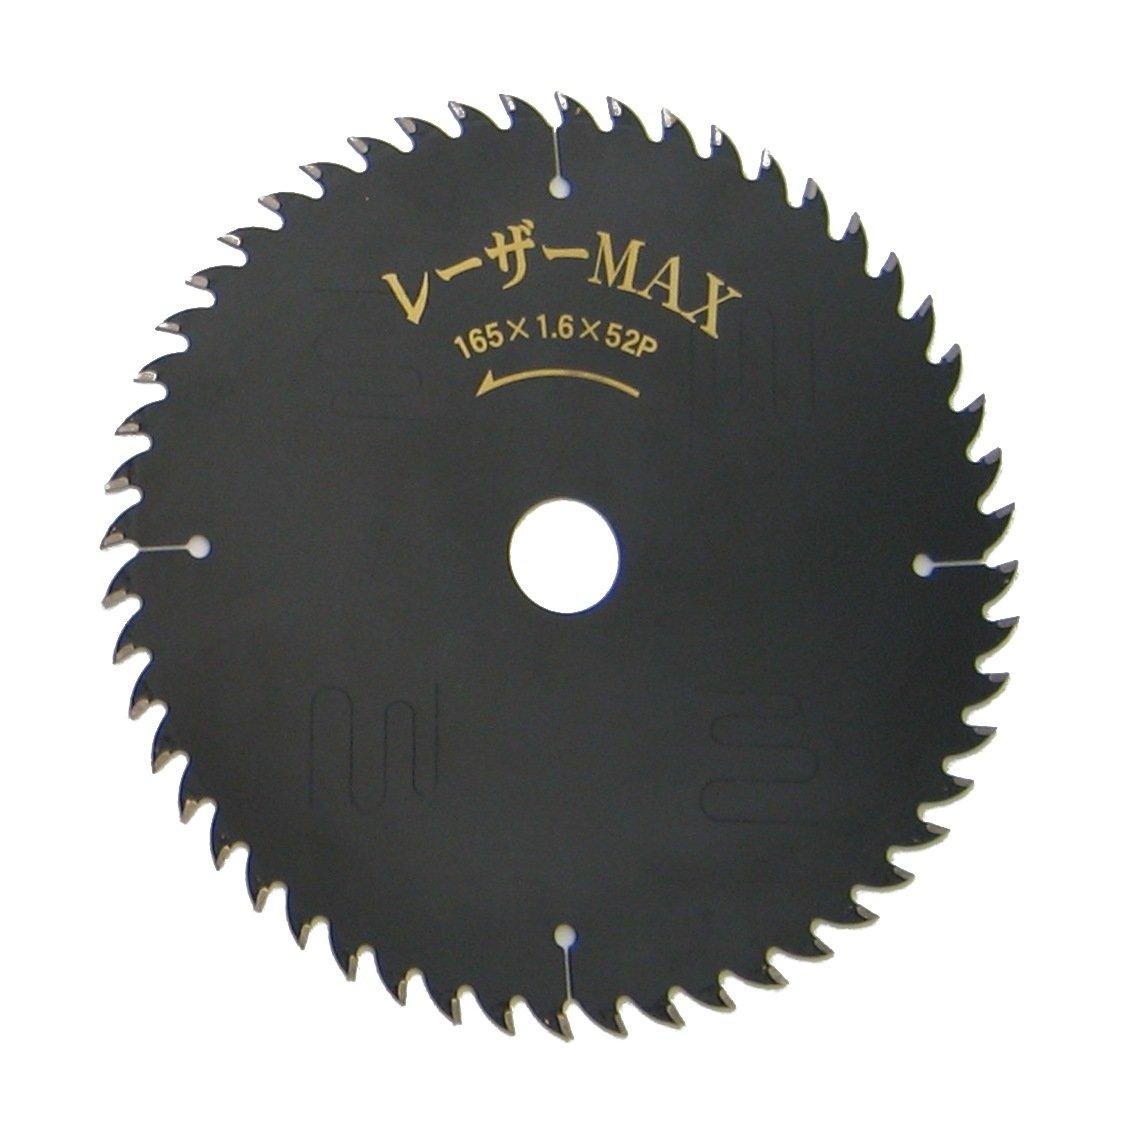 YSK工業 レーザーMAX 216×2.3×100p×25.4 木材集成材用チップソー MAX-216TS (スライドトメ切り用) 消音レーザー入り 表面フッ素加工 B00AH4R1C4 216X2.3X100PX25.4 216X2.3X100PX25.4